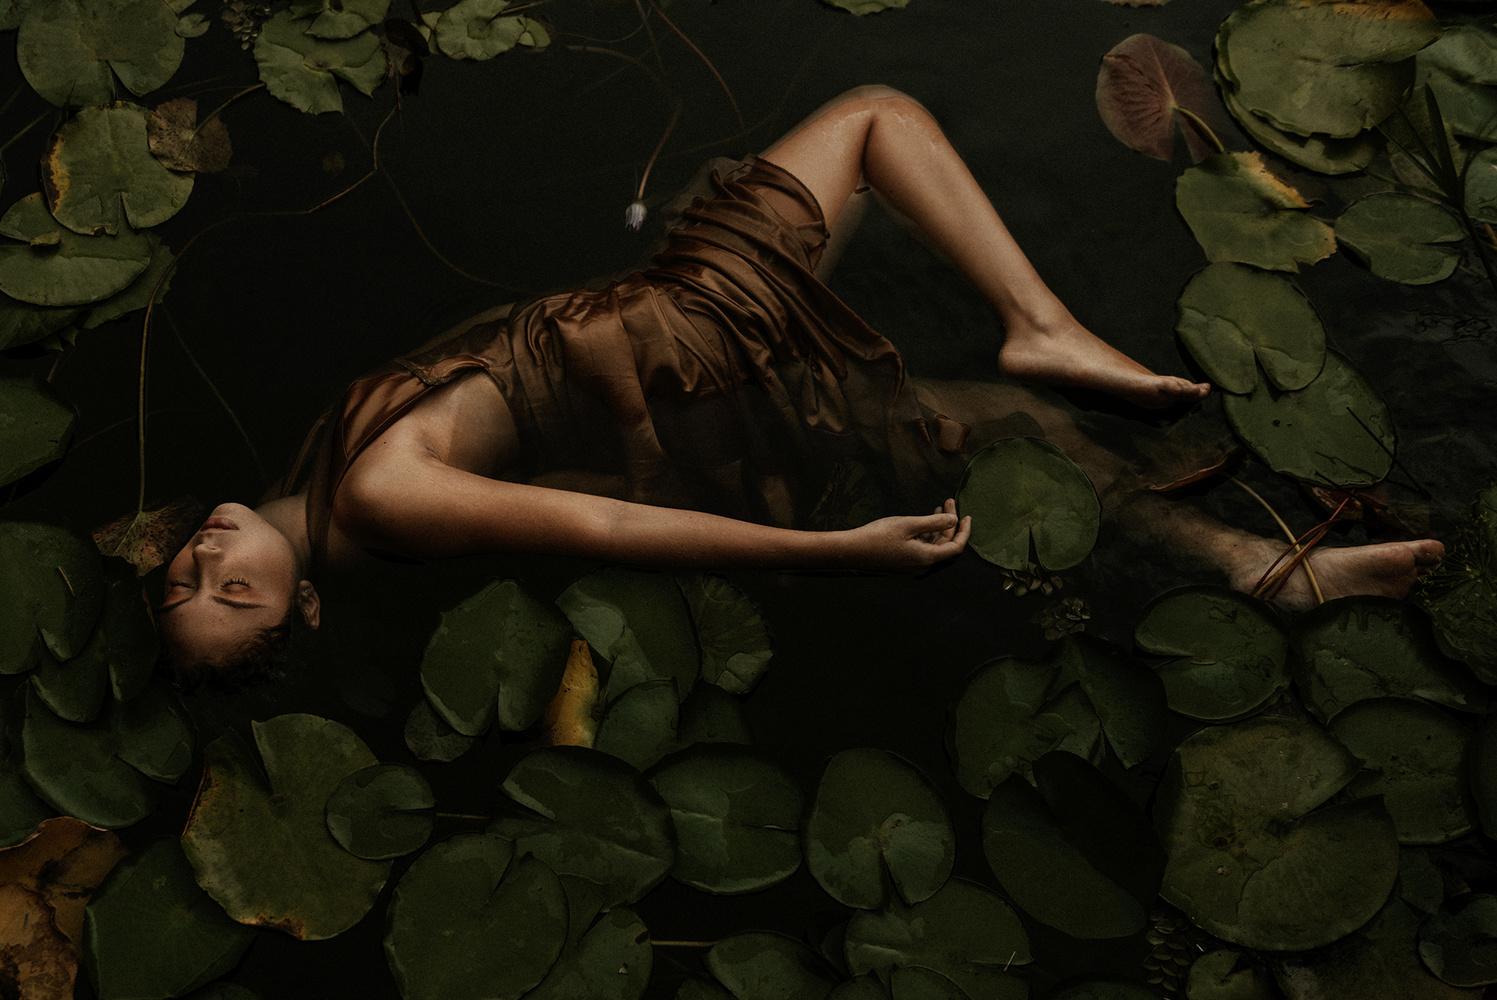 DAFNE II by Paola Padron